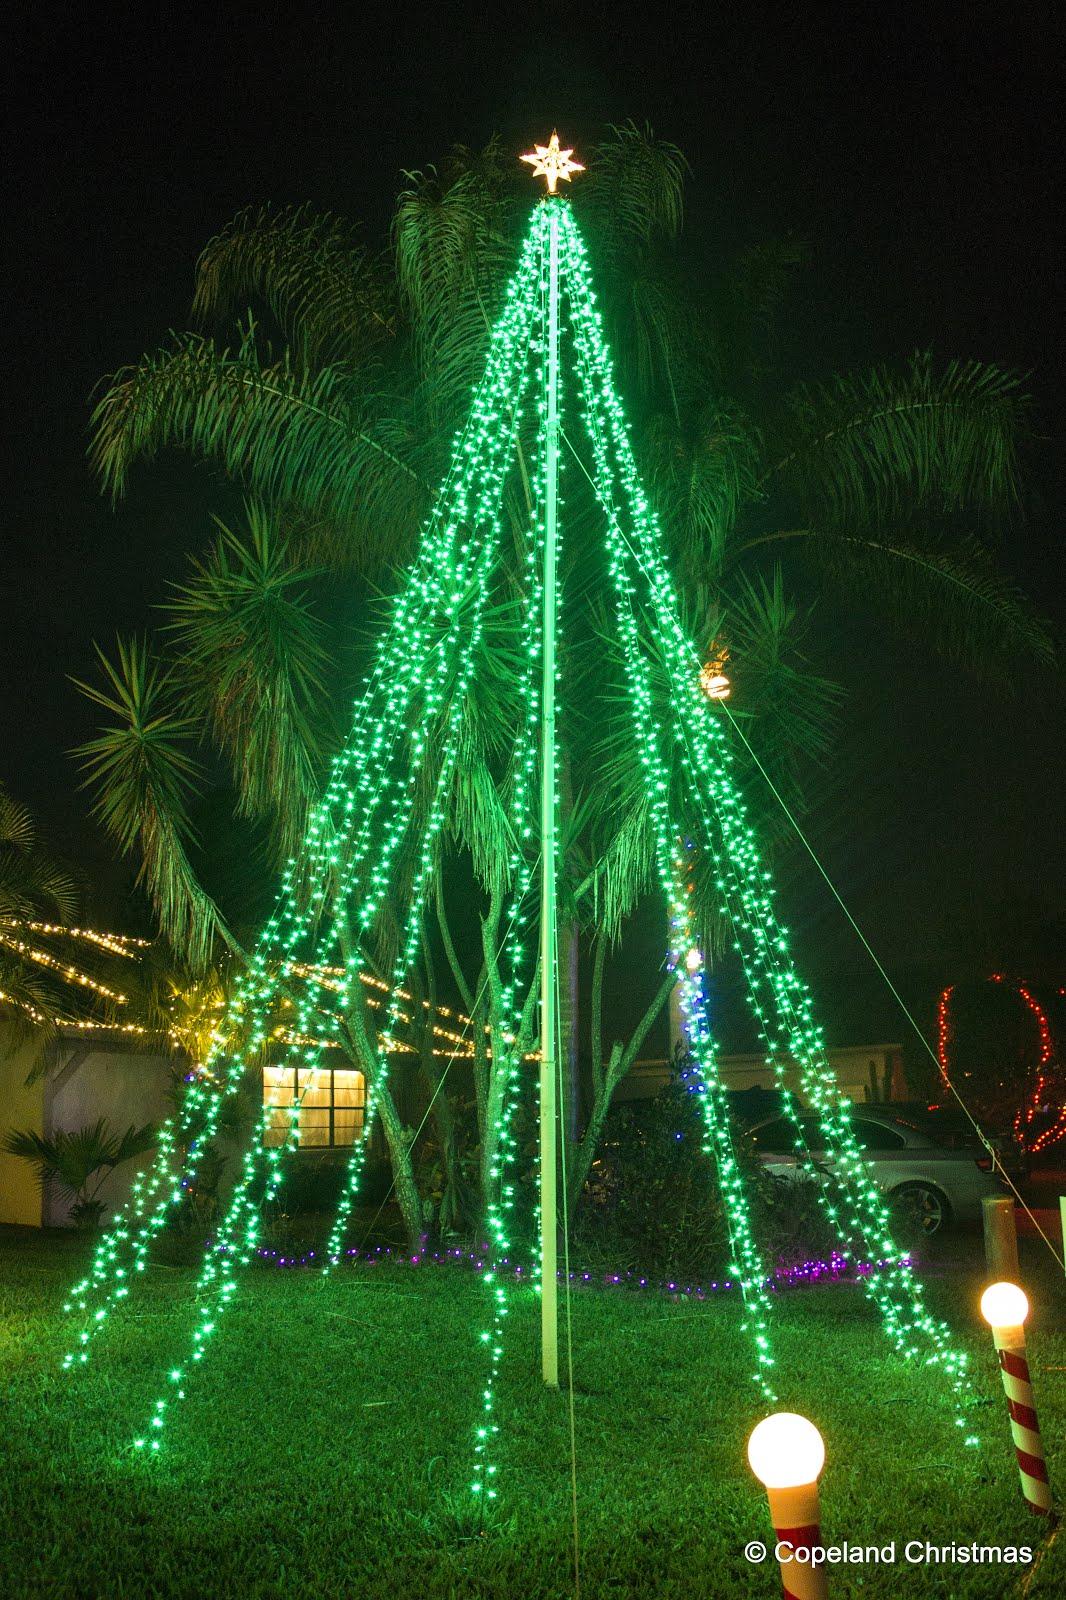 Copeland Christmas Blog The Mega Tree At Copeland Christmas